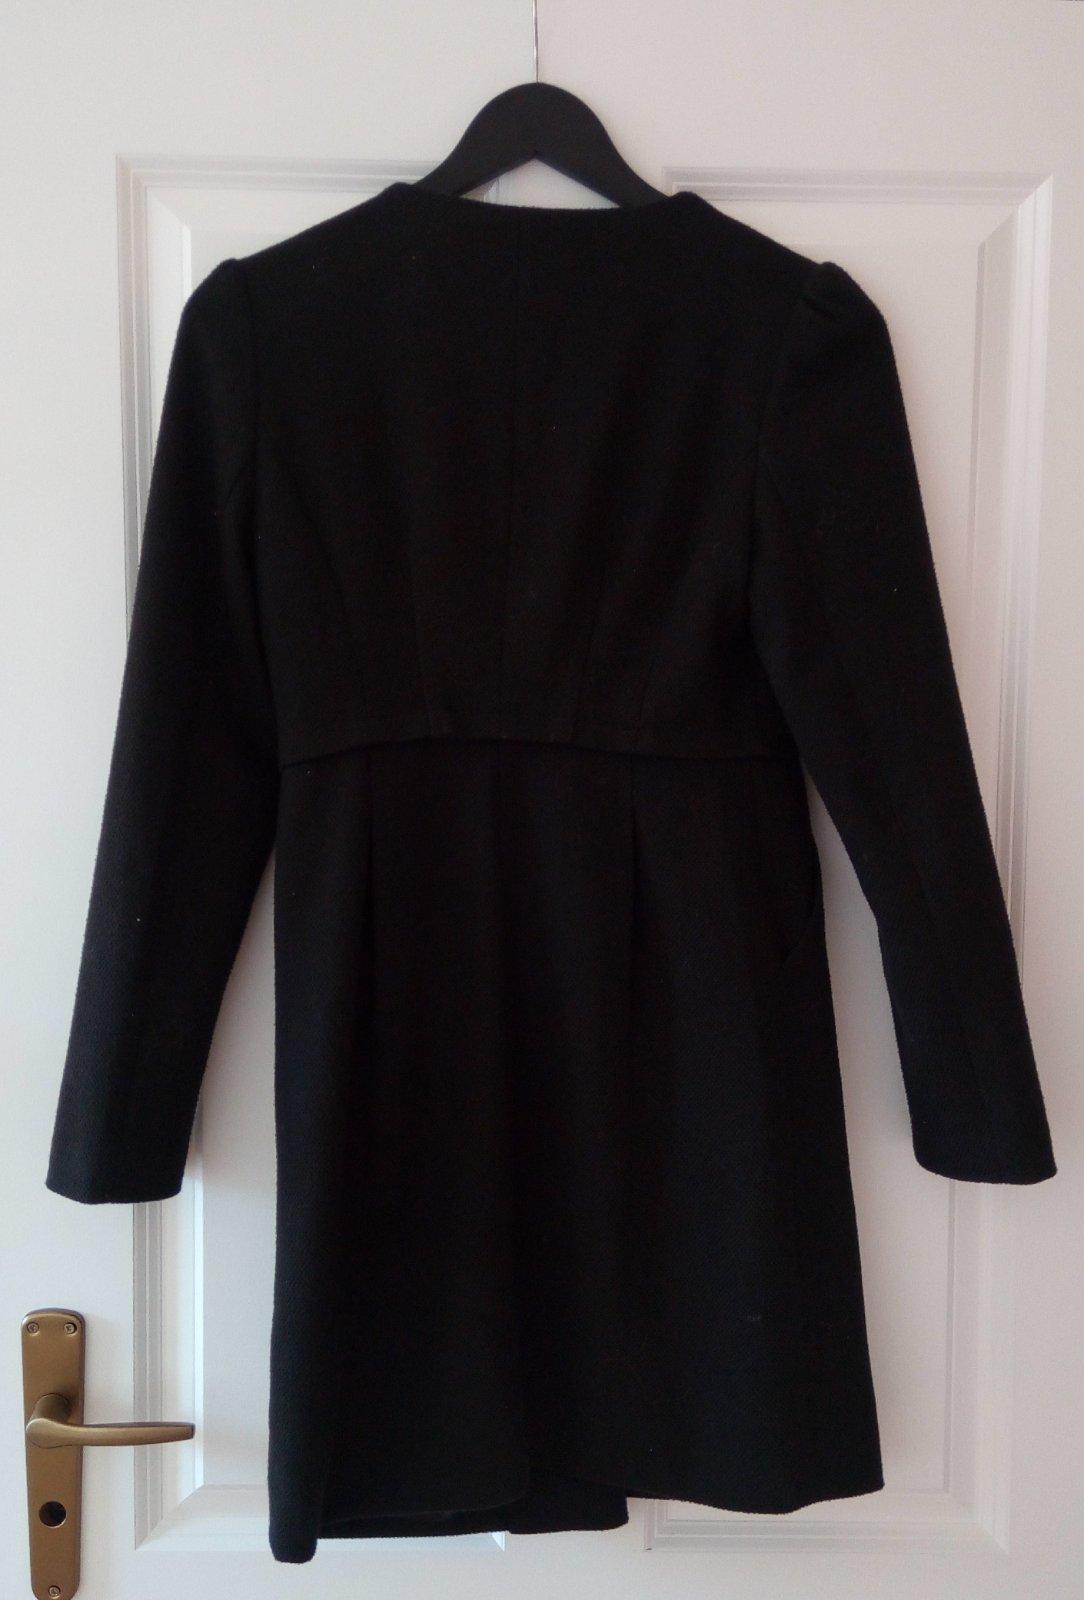 Čierny kabát/sako S - Obrázok č. 3